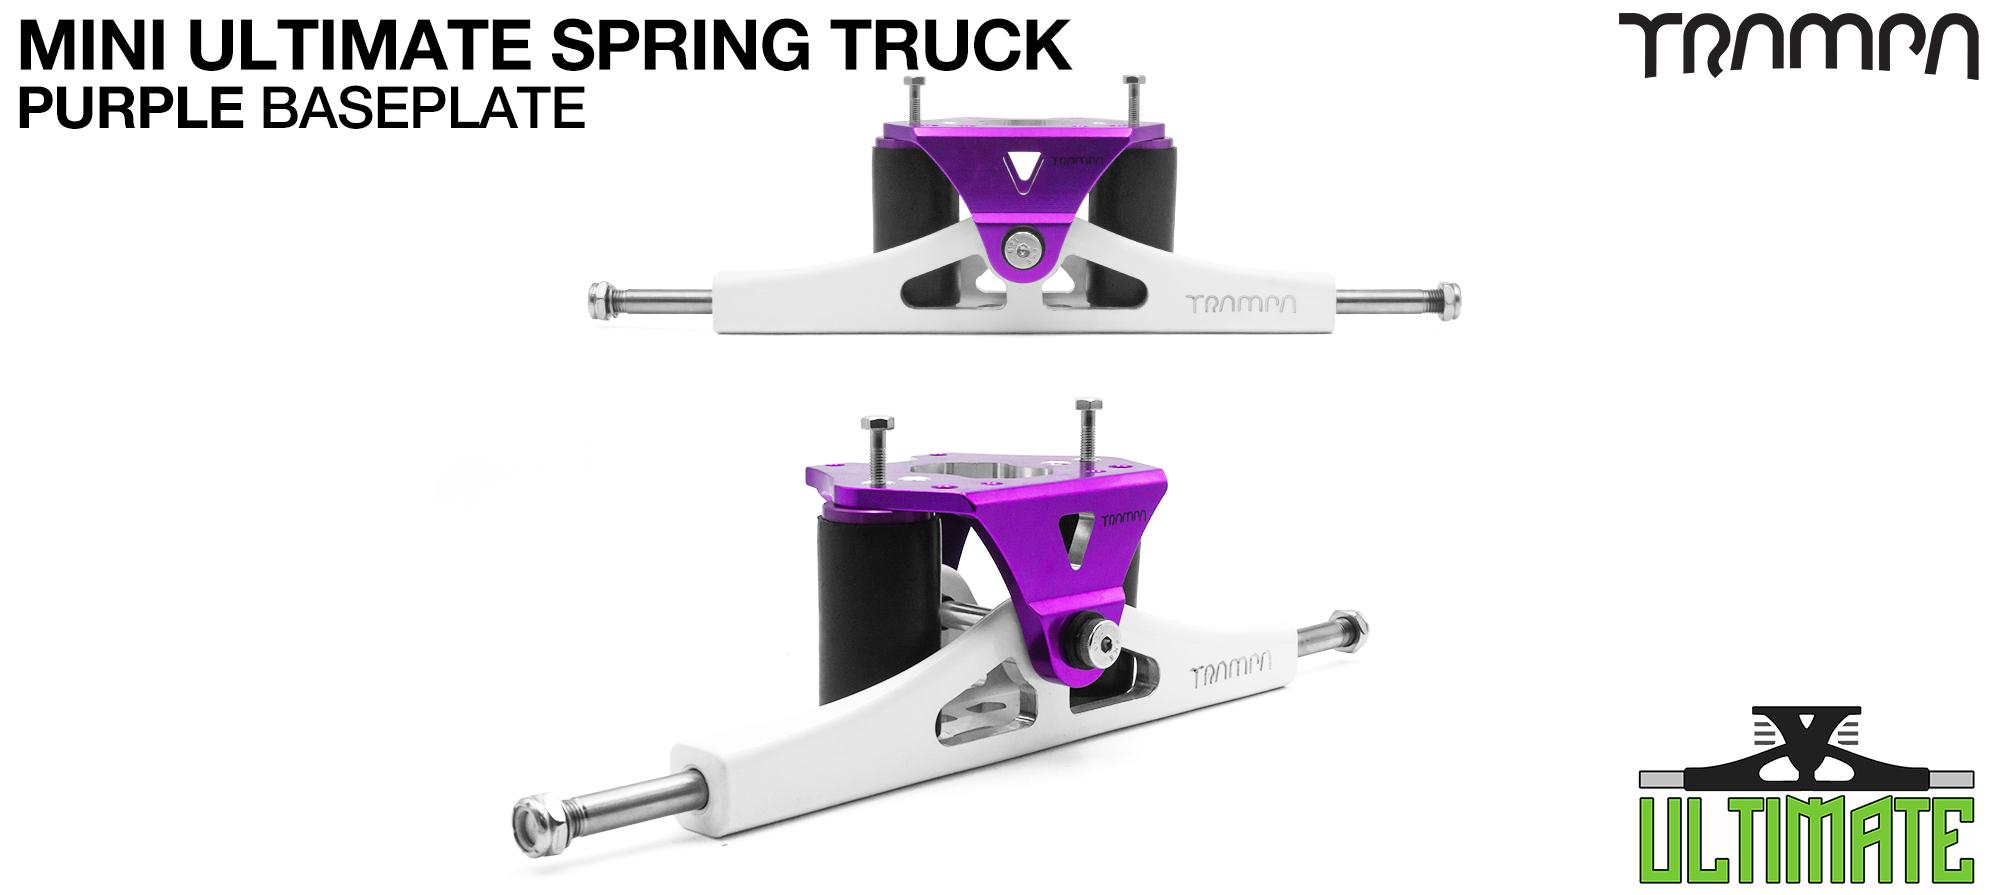 Mini ULTIMATE TRAMPA TRUCKS - CNC FORGED Channel Hanger with 9.525mm TITANIUM Axle CNC Baseplate TITANIUM Kingpin - PURPLE